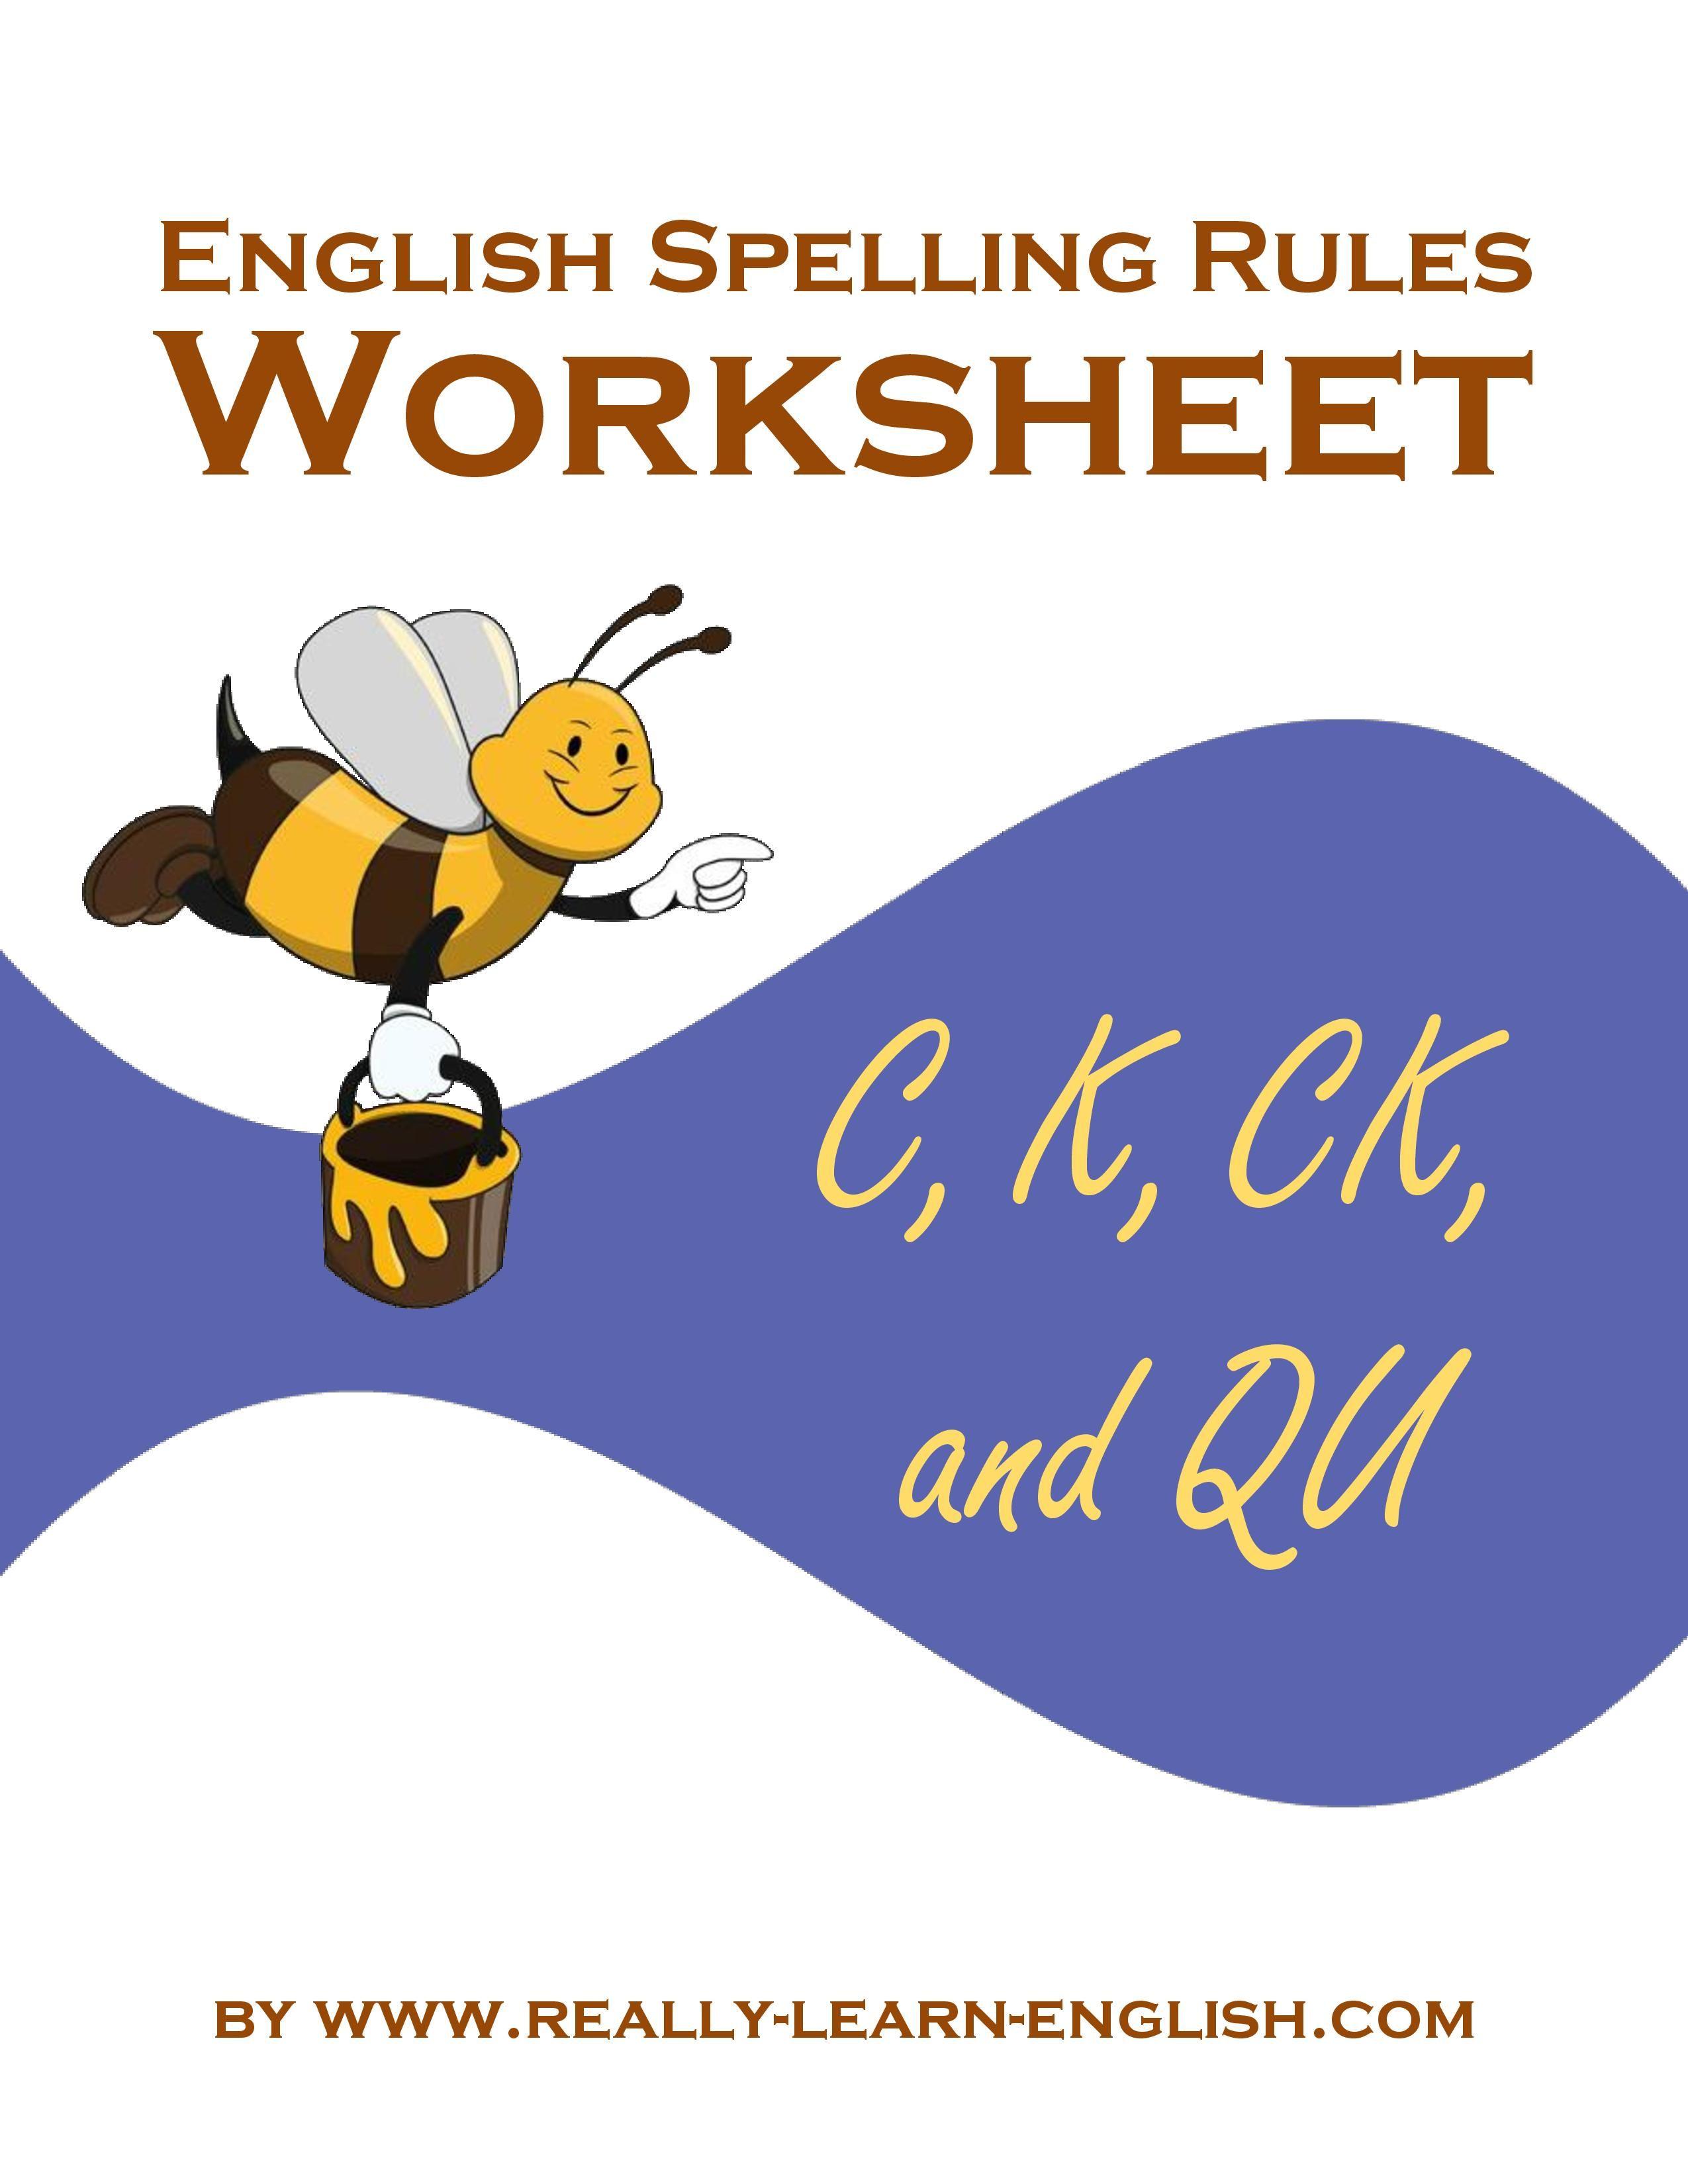 Worksheets Spelling Rules Worksheets english spelling rules and printable worksheets for the k sounds c k